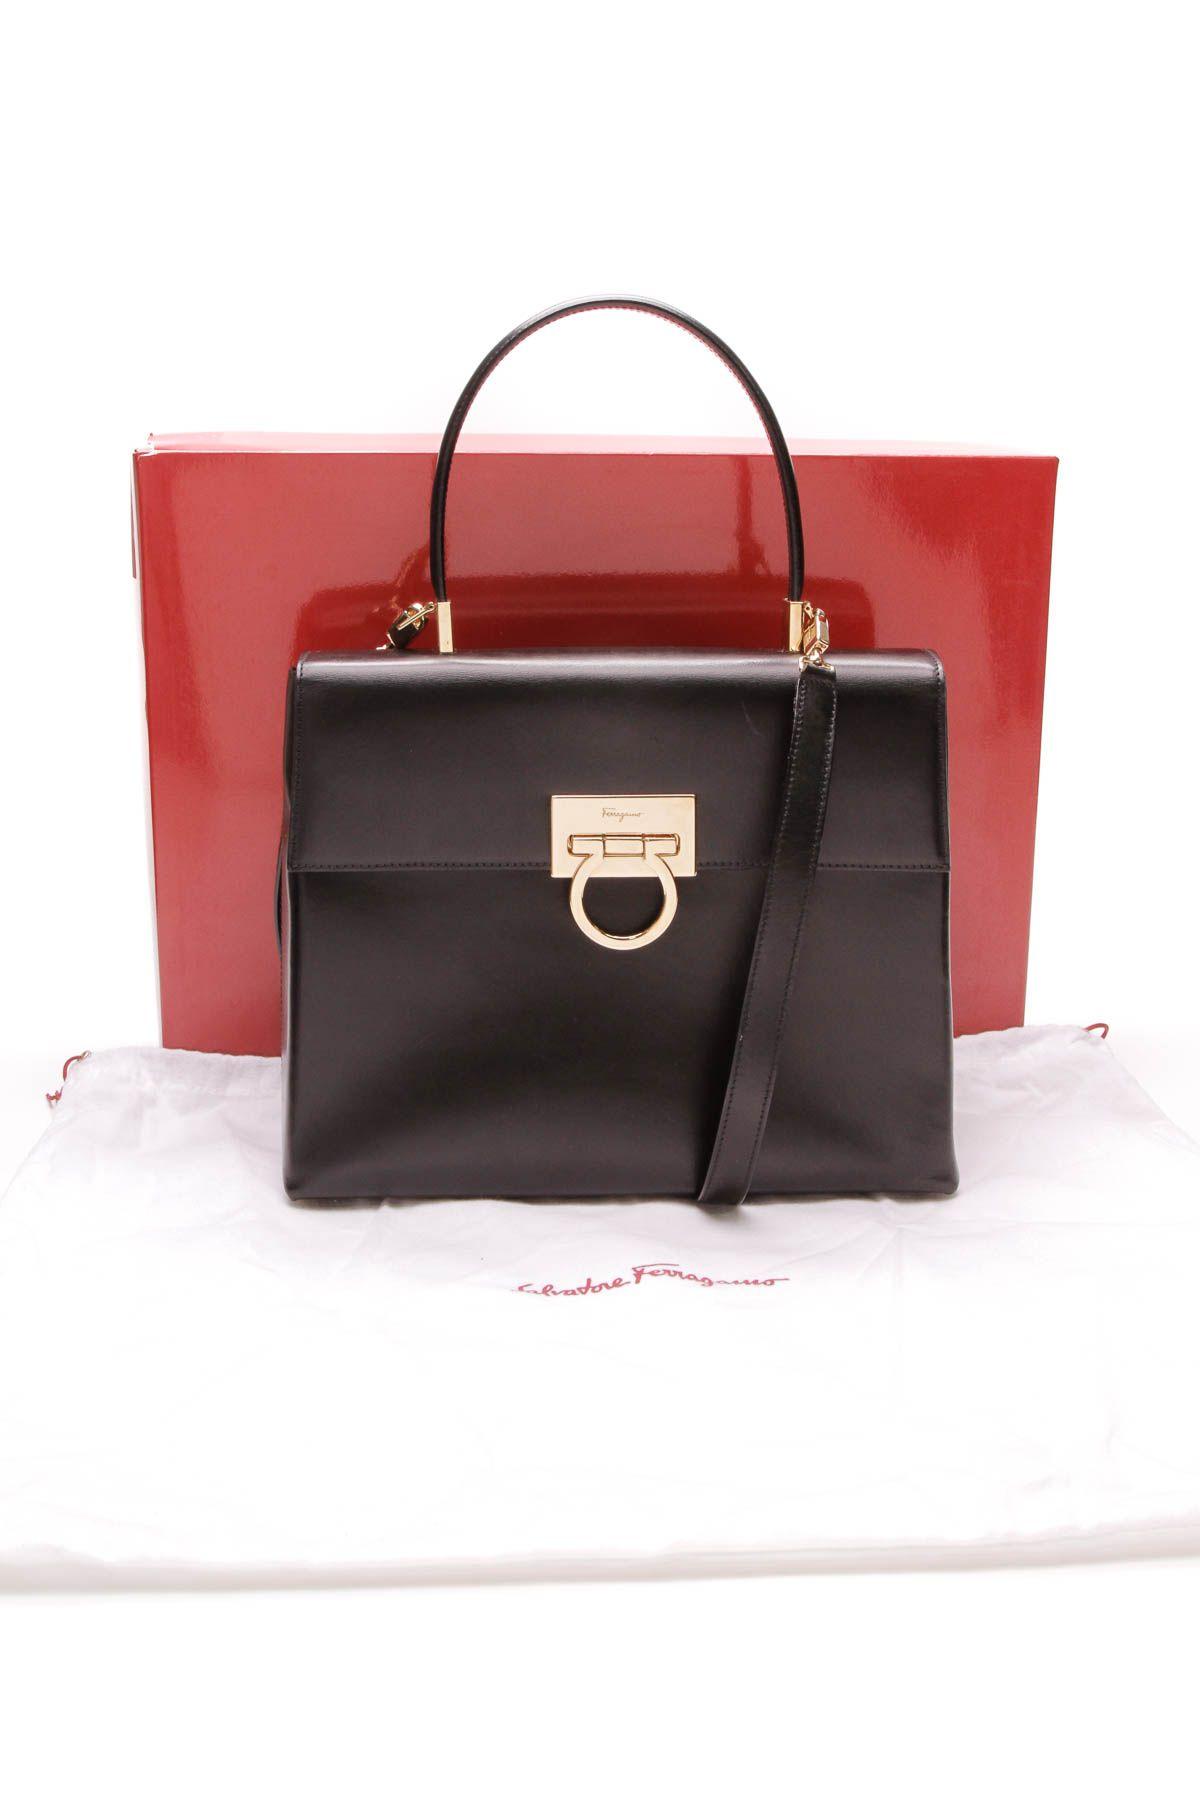 Salvatore Ferragamo Gancini Top Handle Bag - Black 07271bc6c6fa3